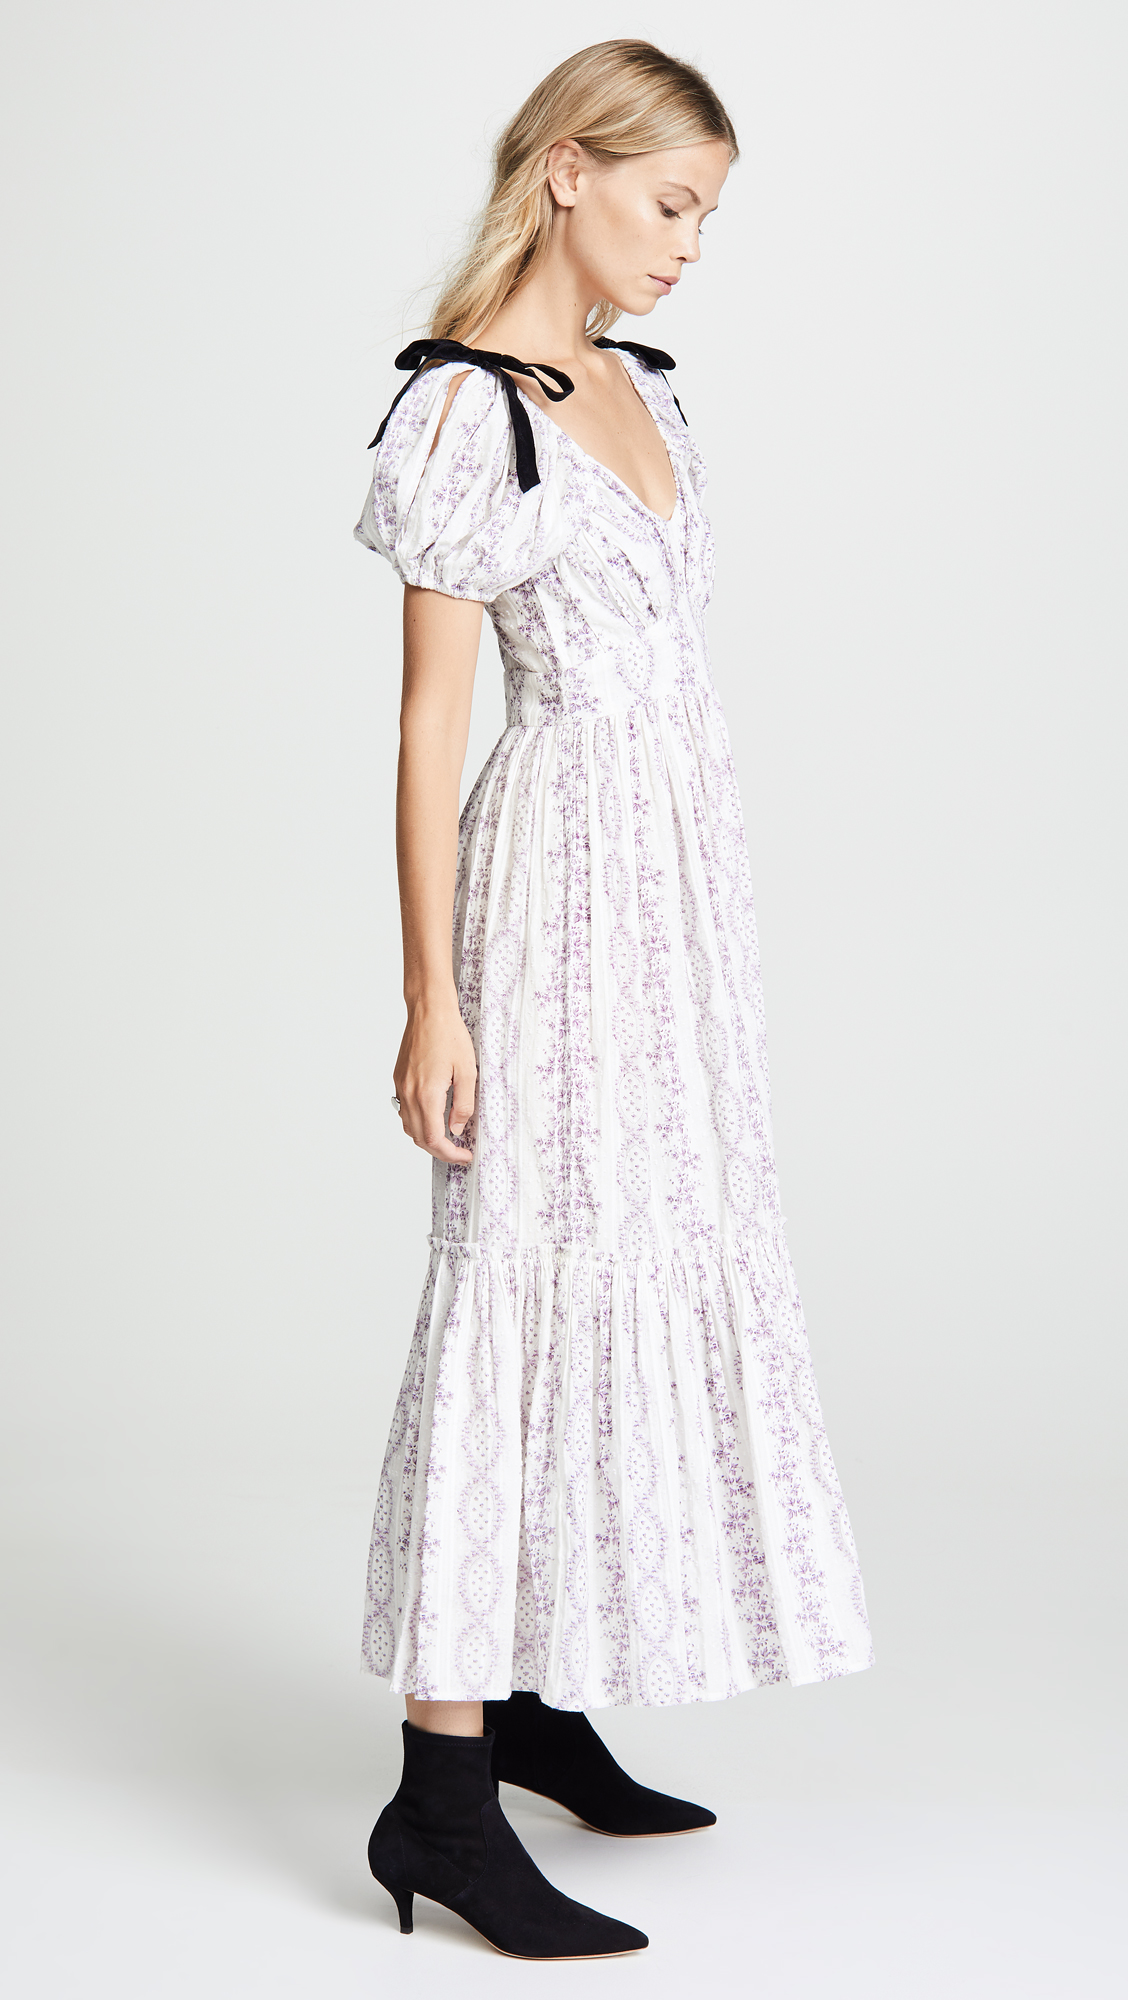 f8c085f2e2 Angie Brand Maxi Dresses